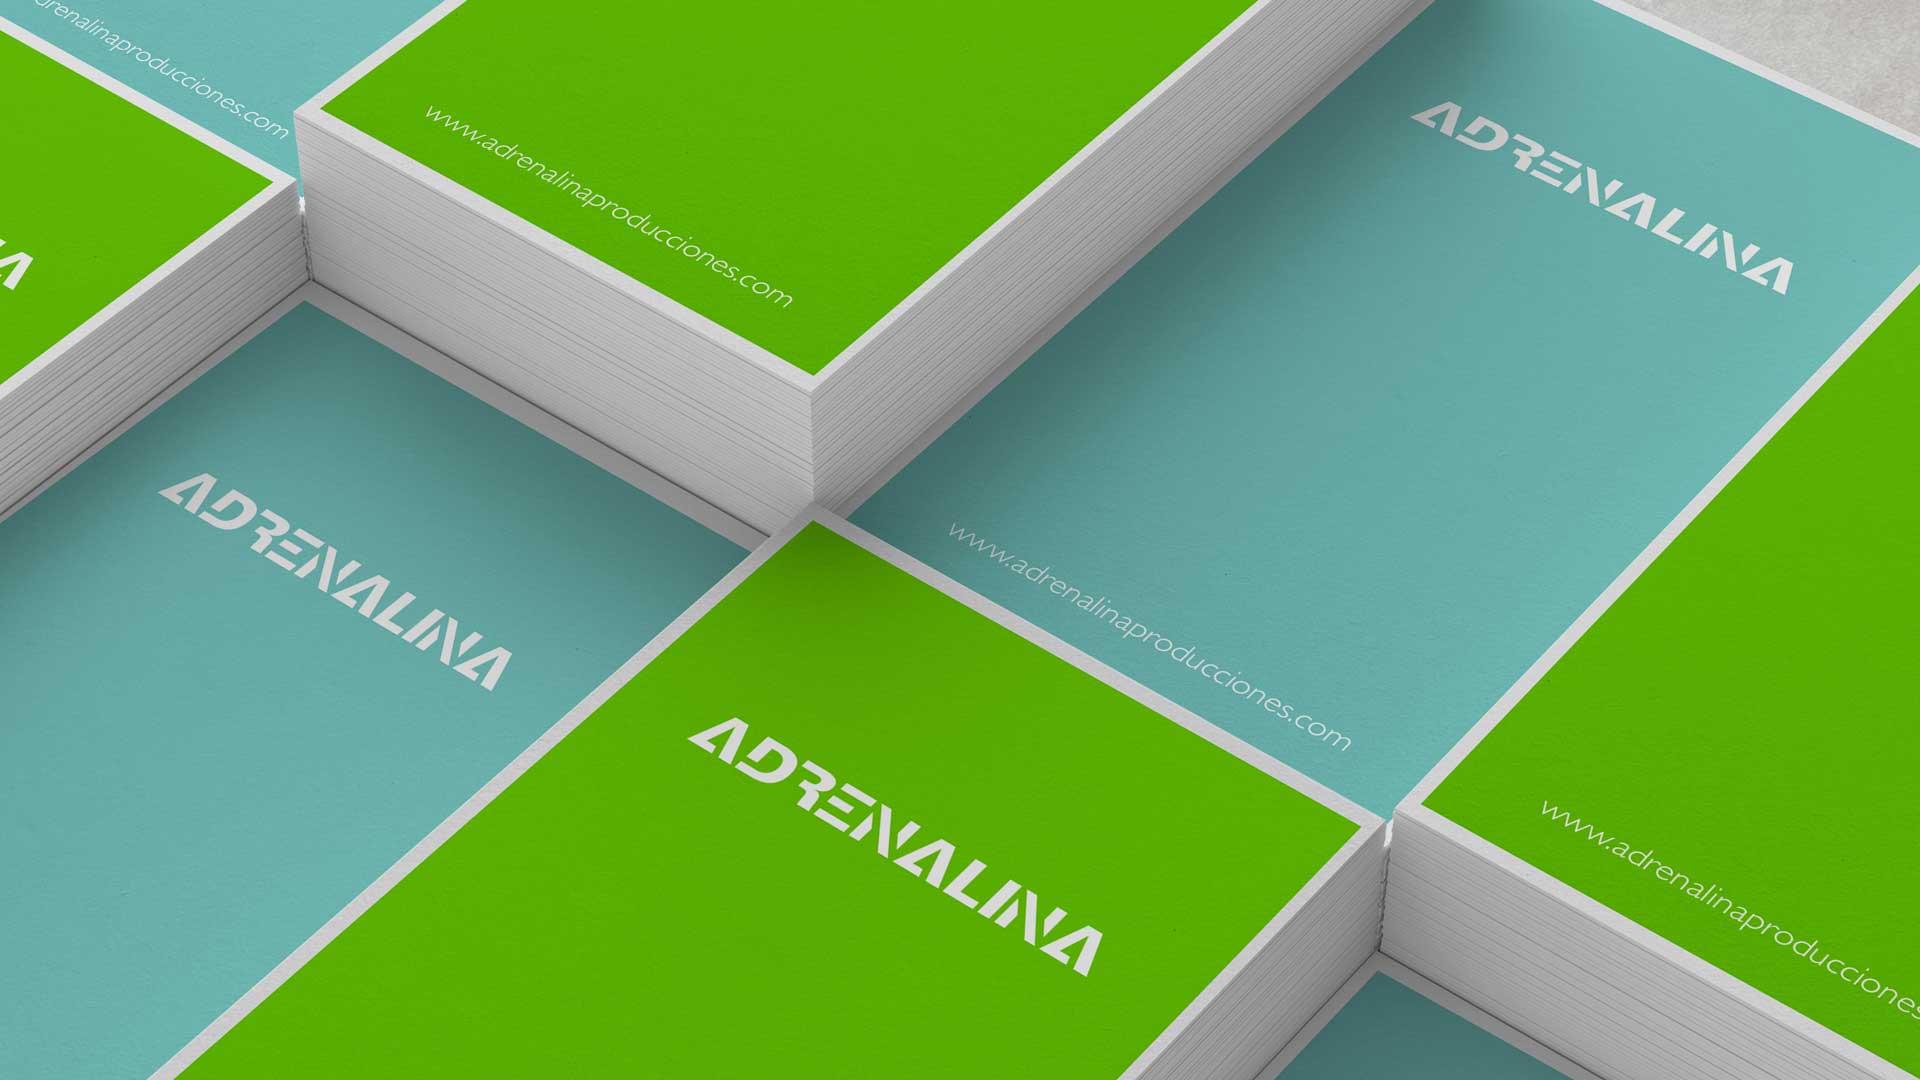 adrenalina_branding_identity_6